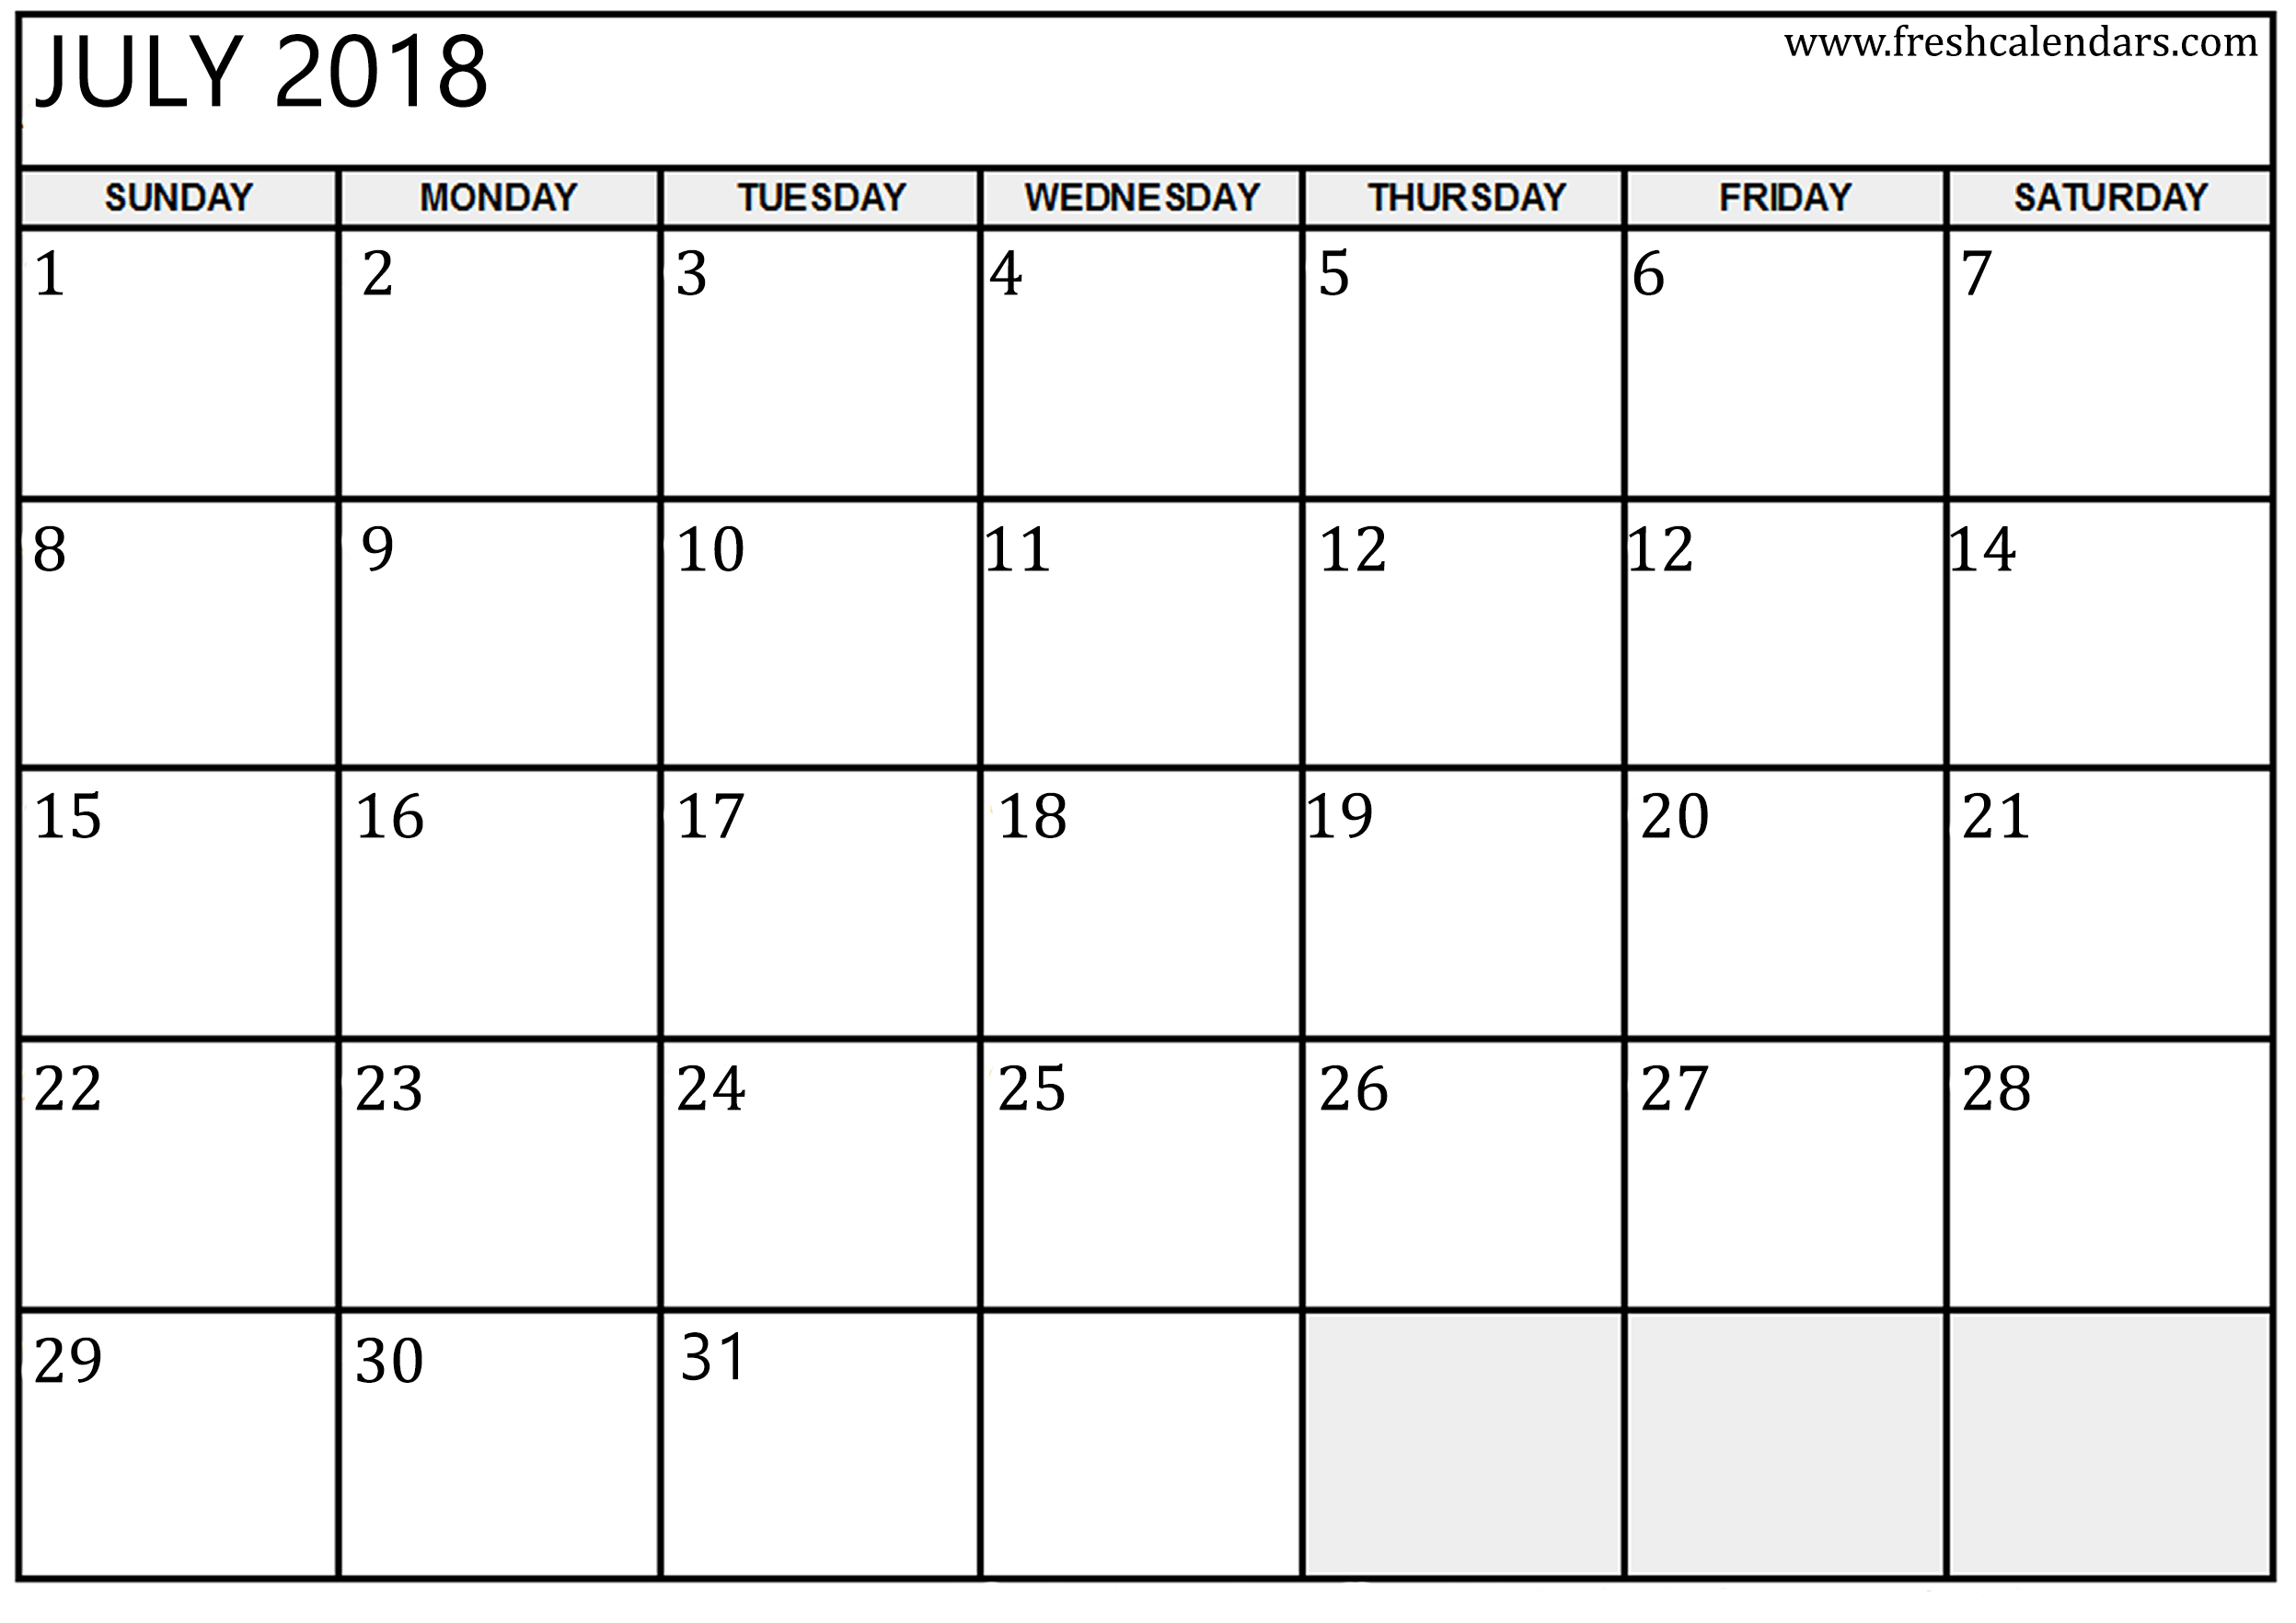 July 2018 Activity Calendar